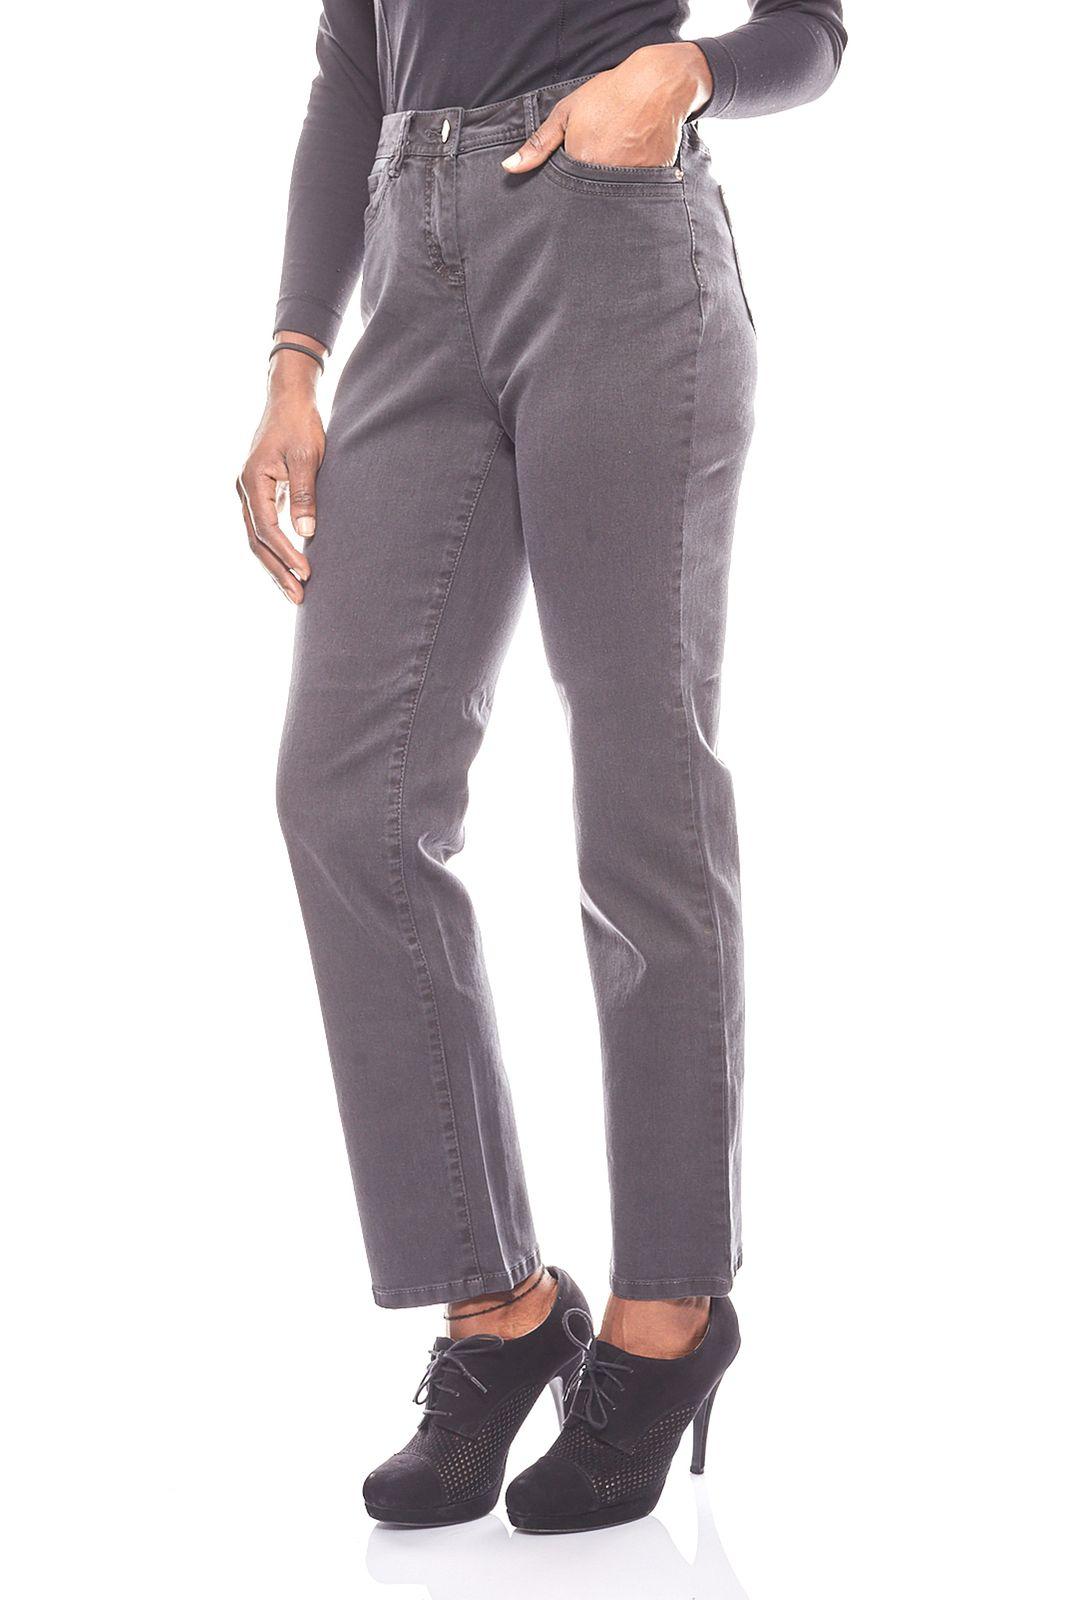 Tamaris Hose stylische Damen Jeans im Used Look Kurzgröße Blau | B2B